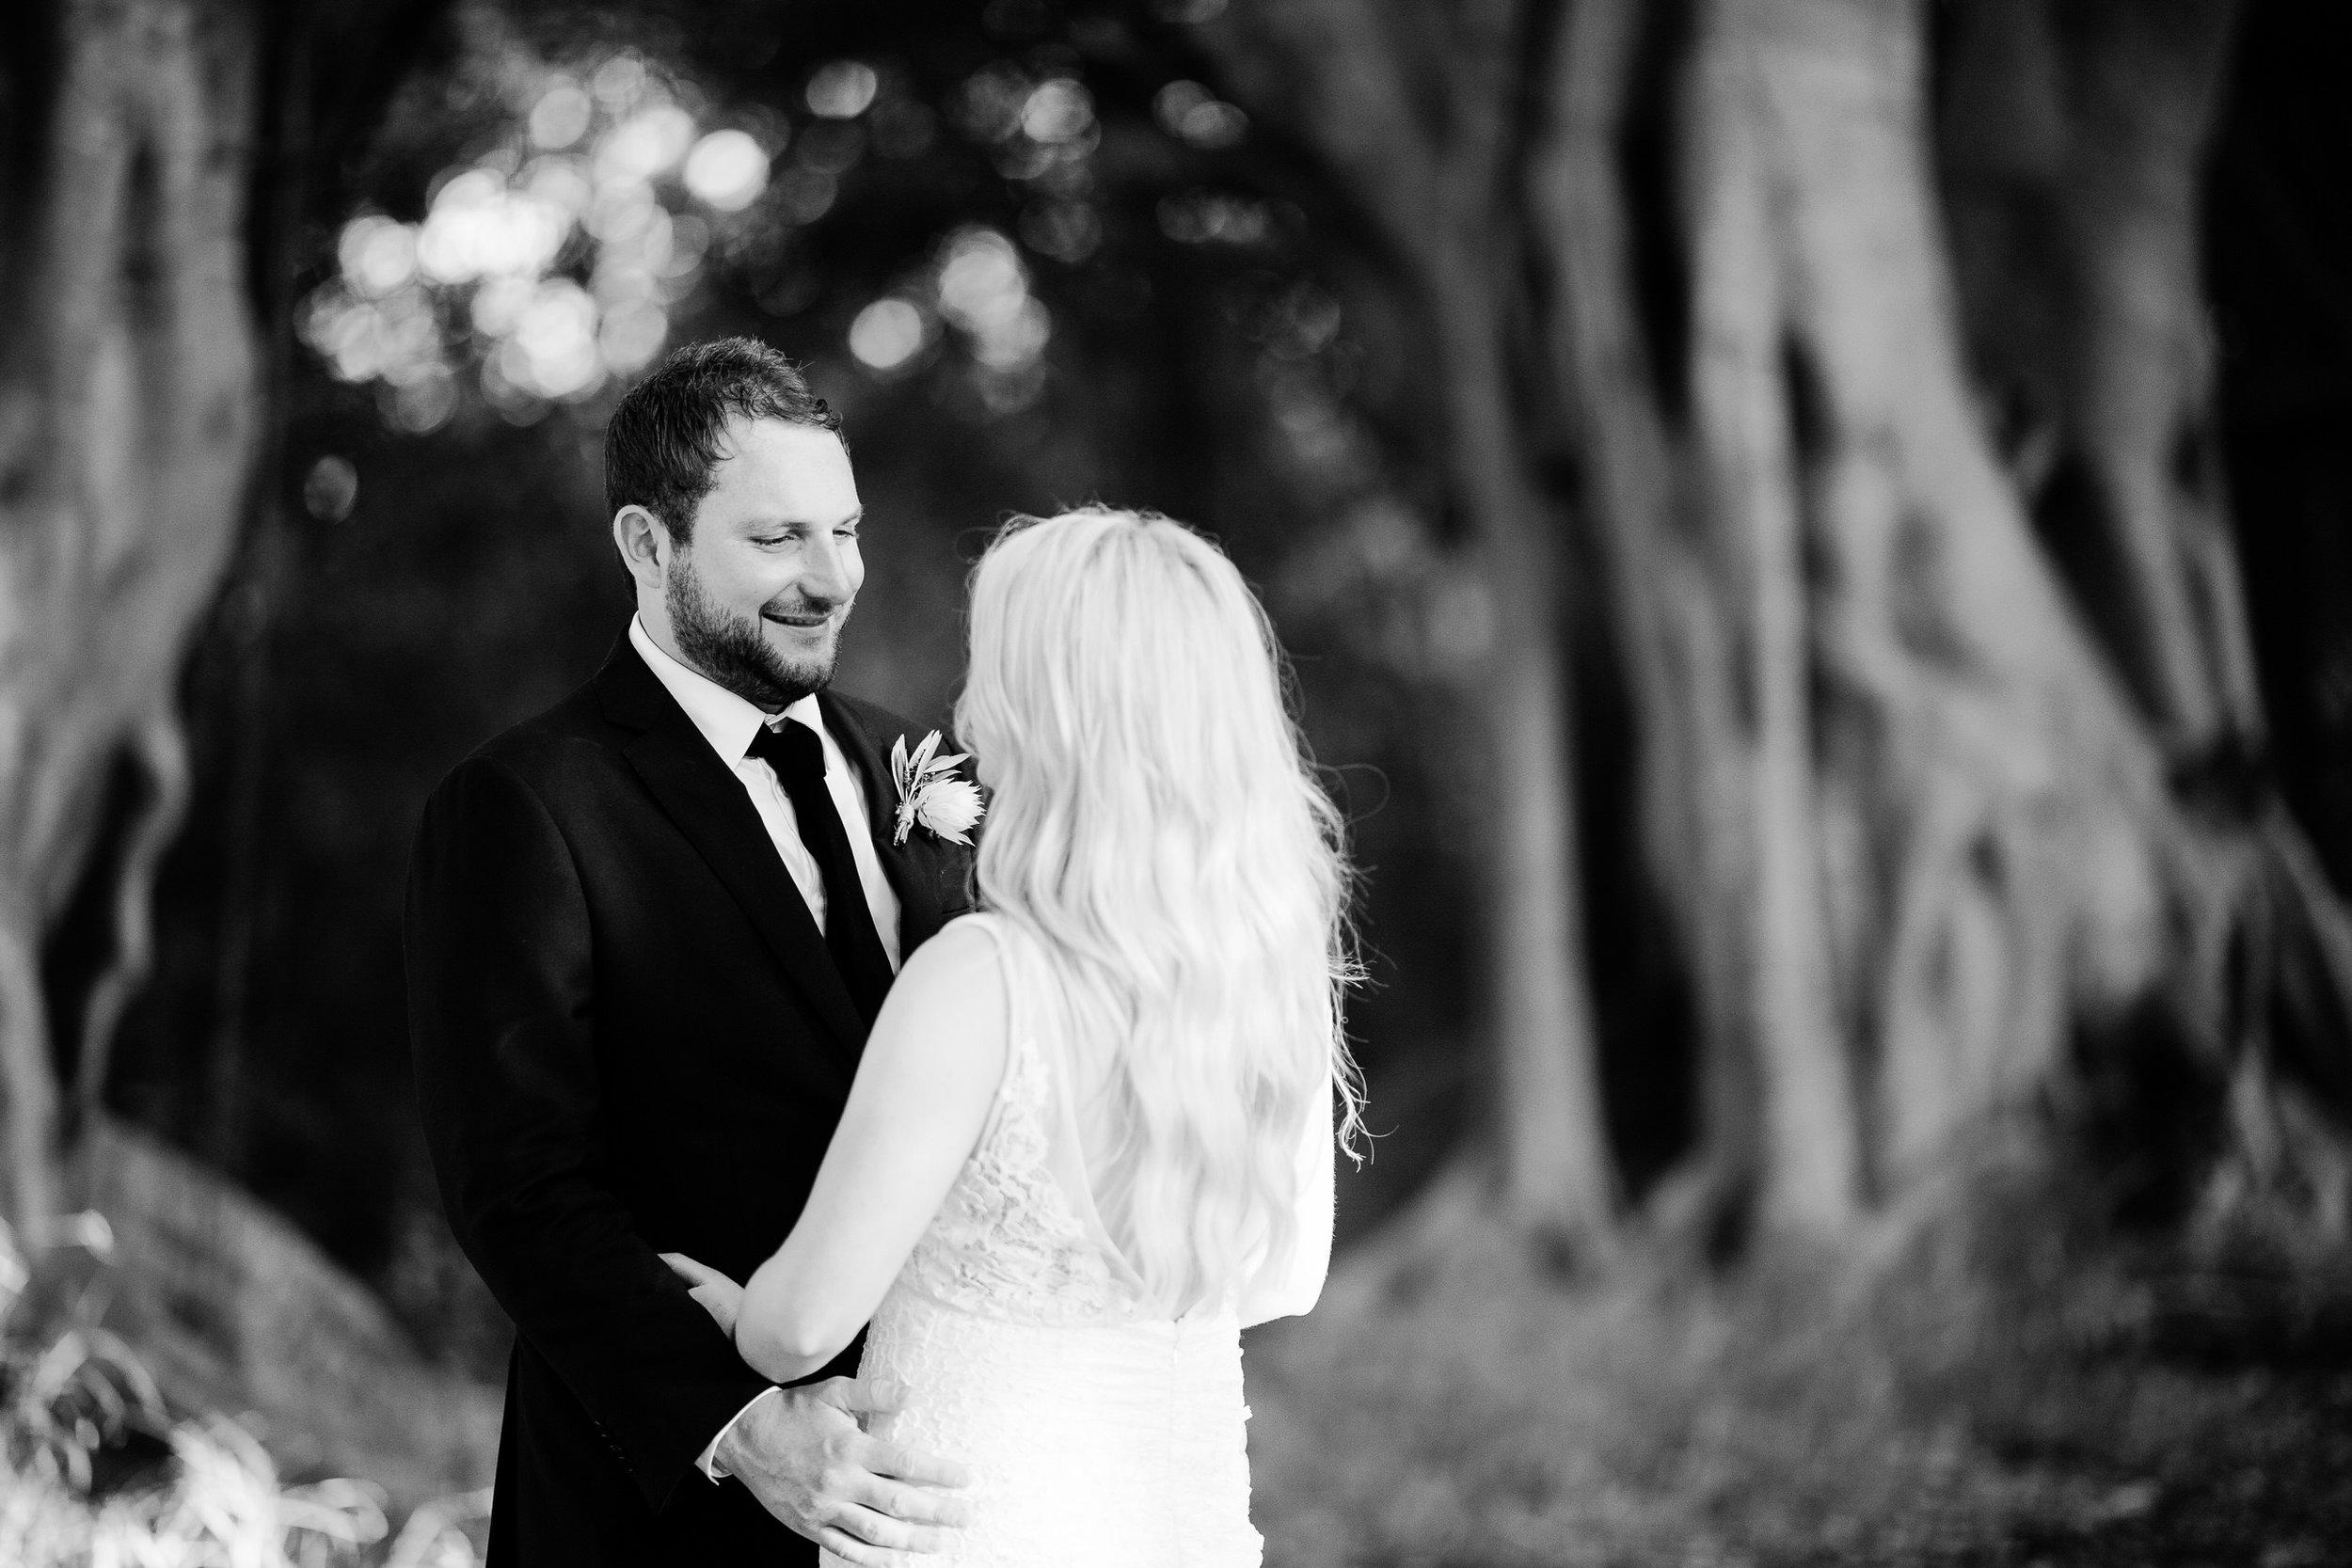 Justin_And_Jim_Photography_Byron_Bay_Wedding081.JPG